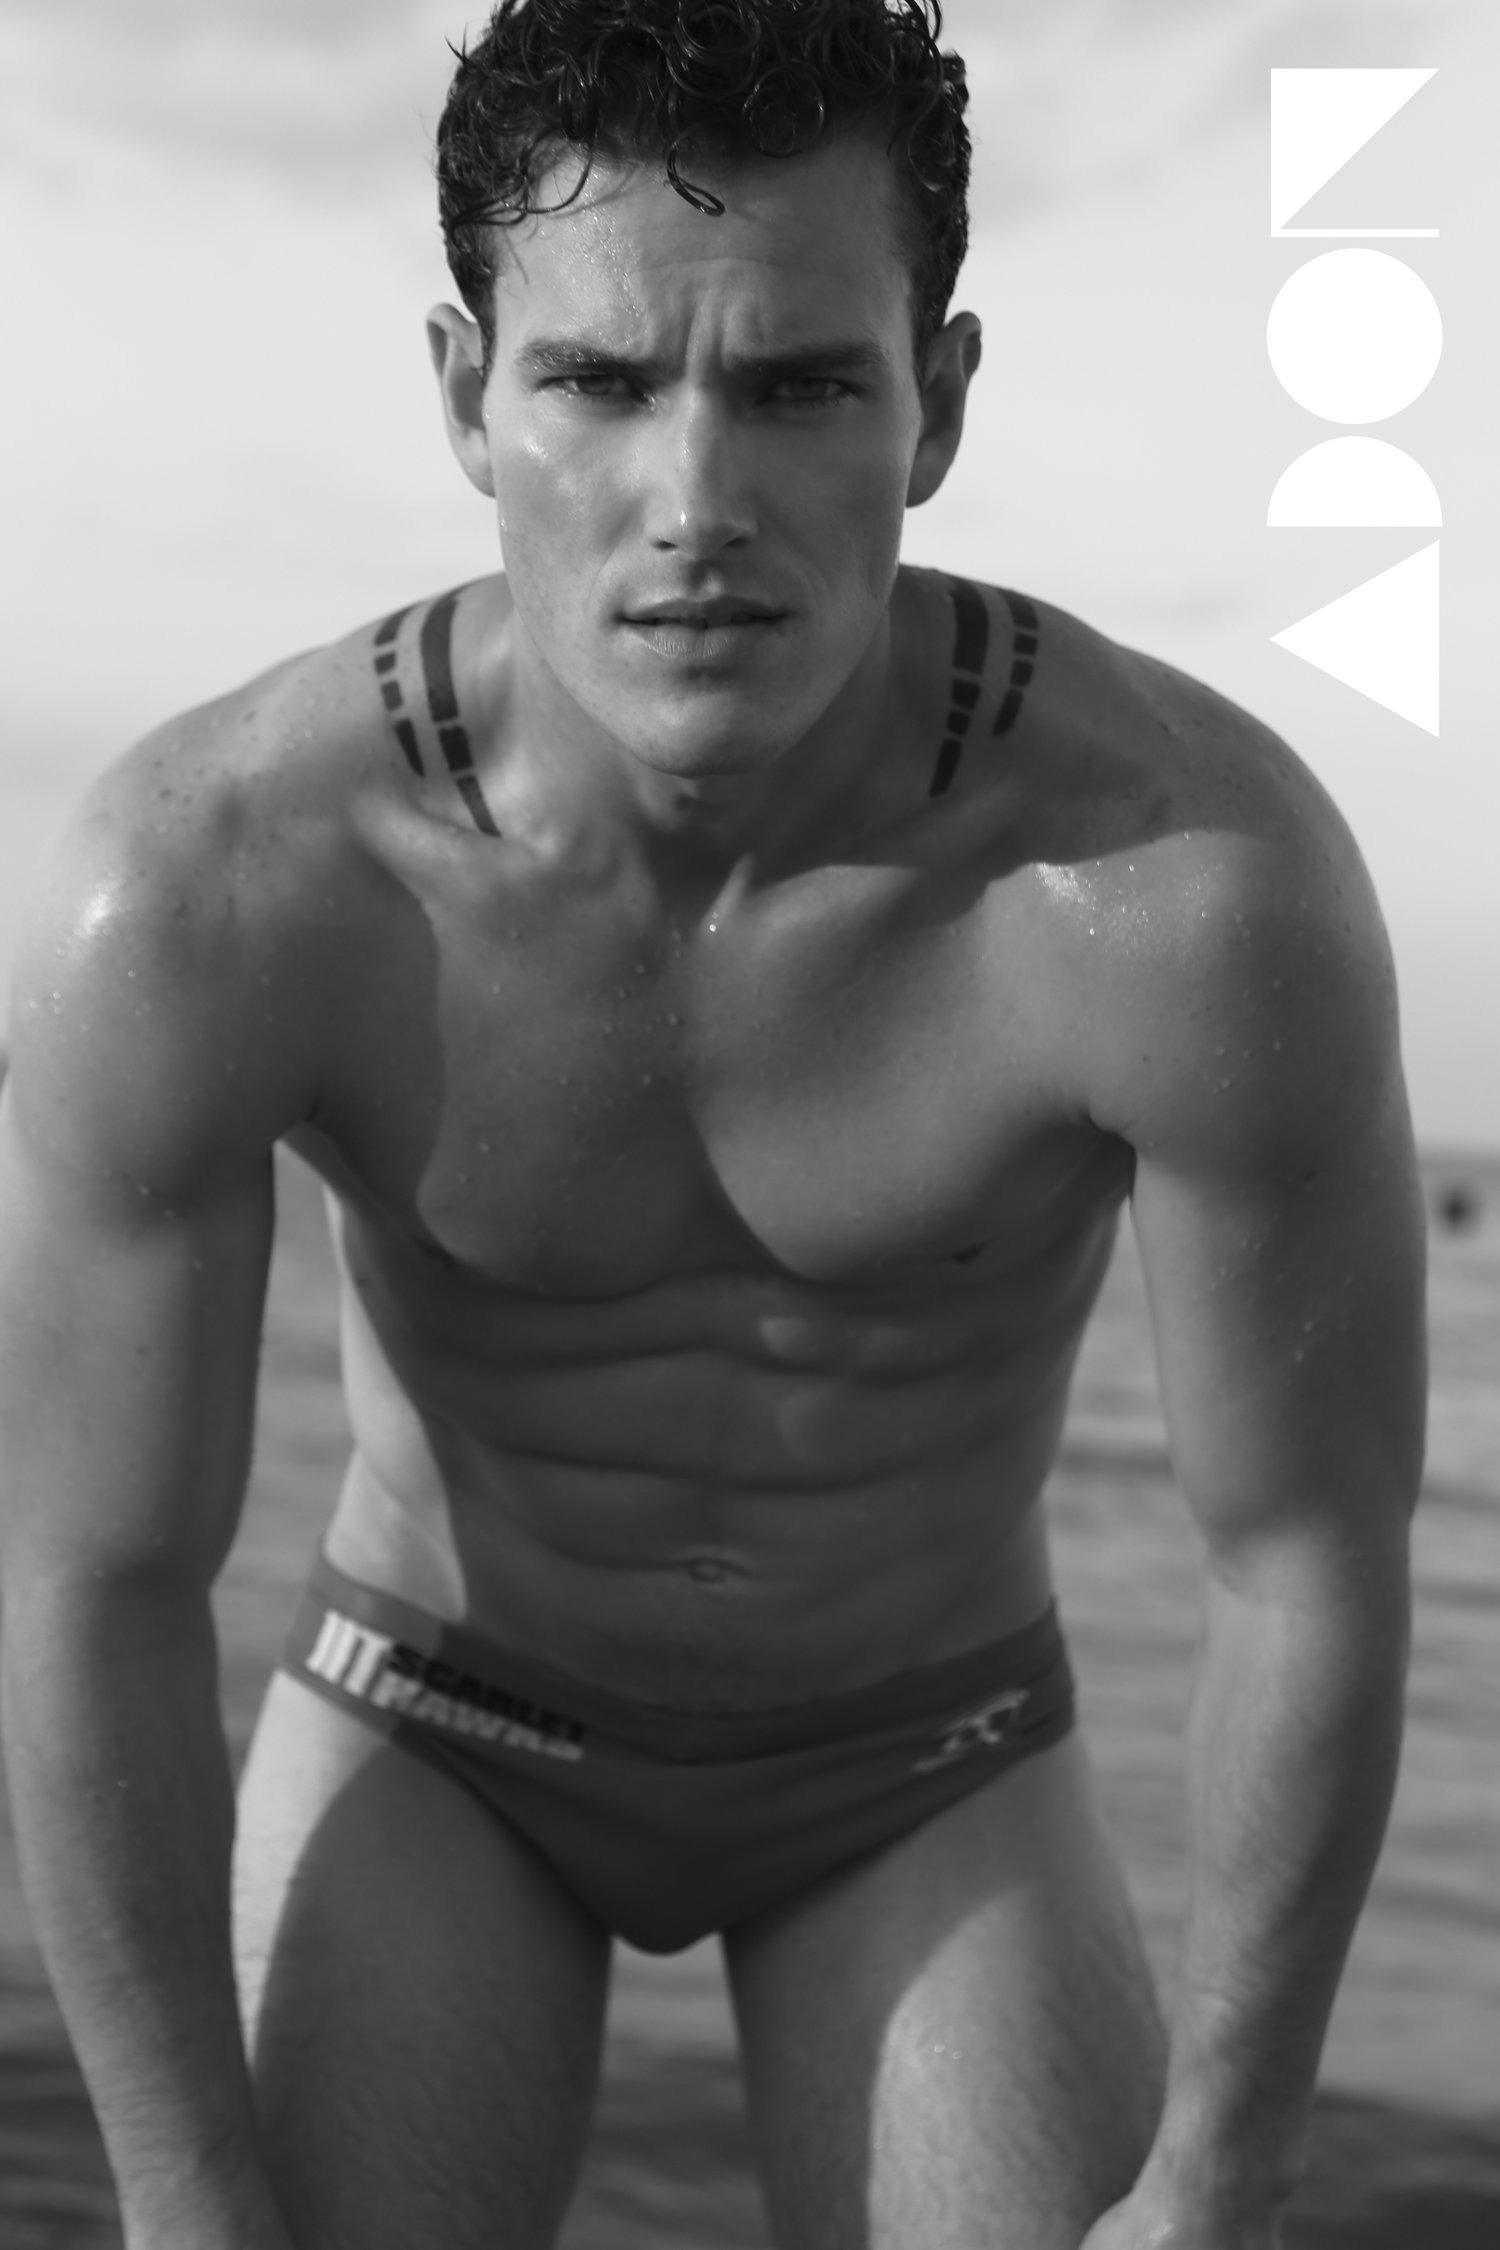 Adon Exclusive: Model JEFFERSON WEST By MICHAEL DAR